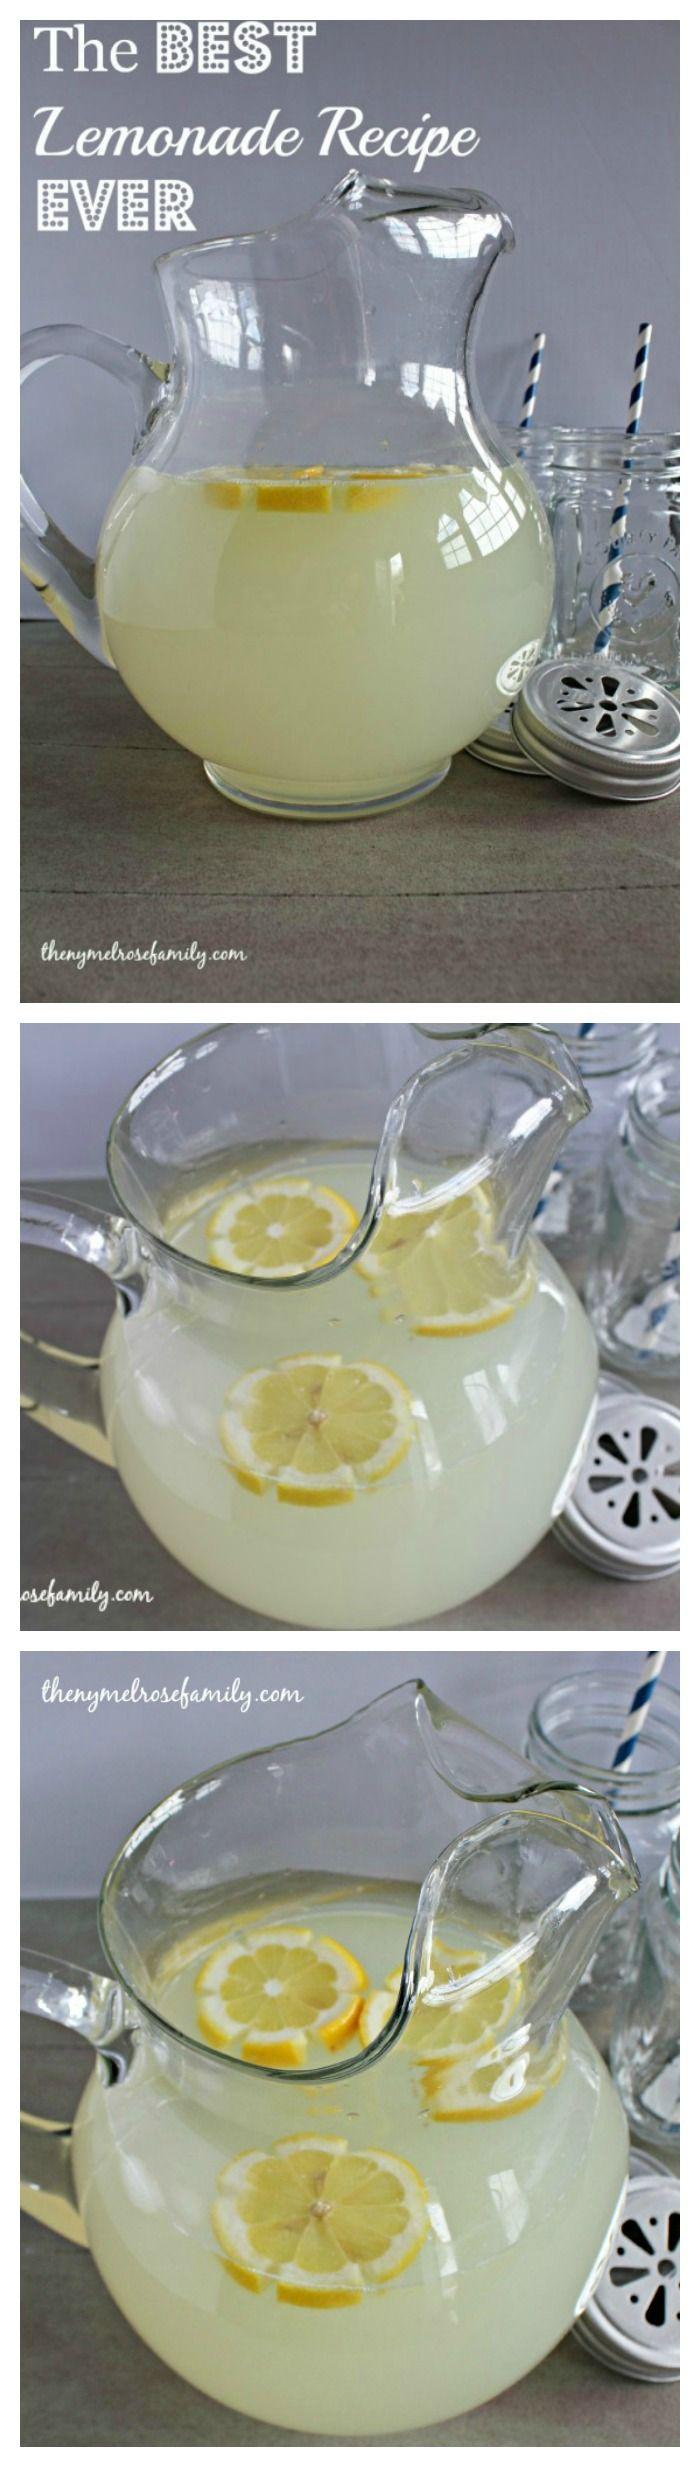 Lemonade Recipe: The Best Refreshing Lemonade Recipe